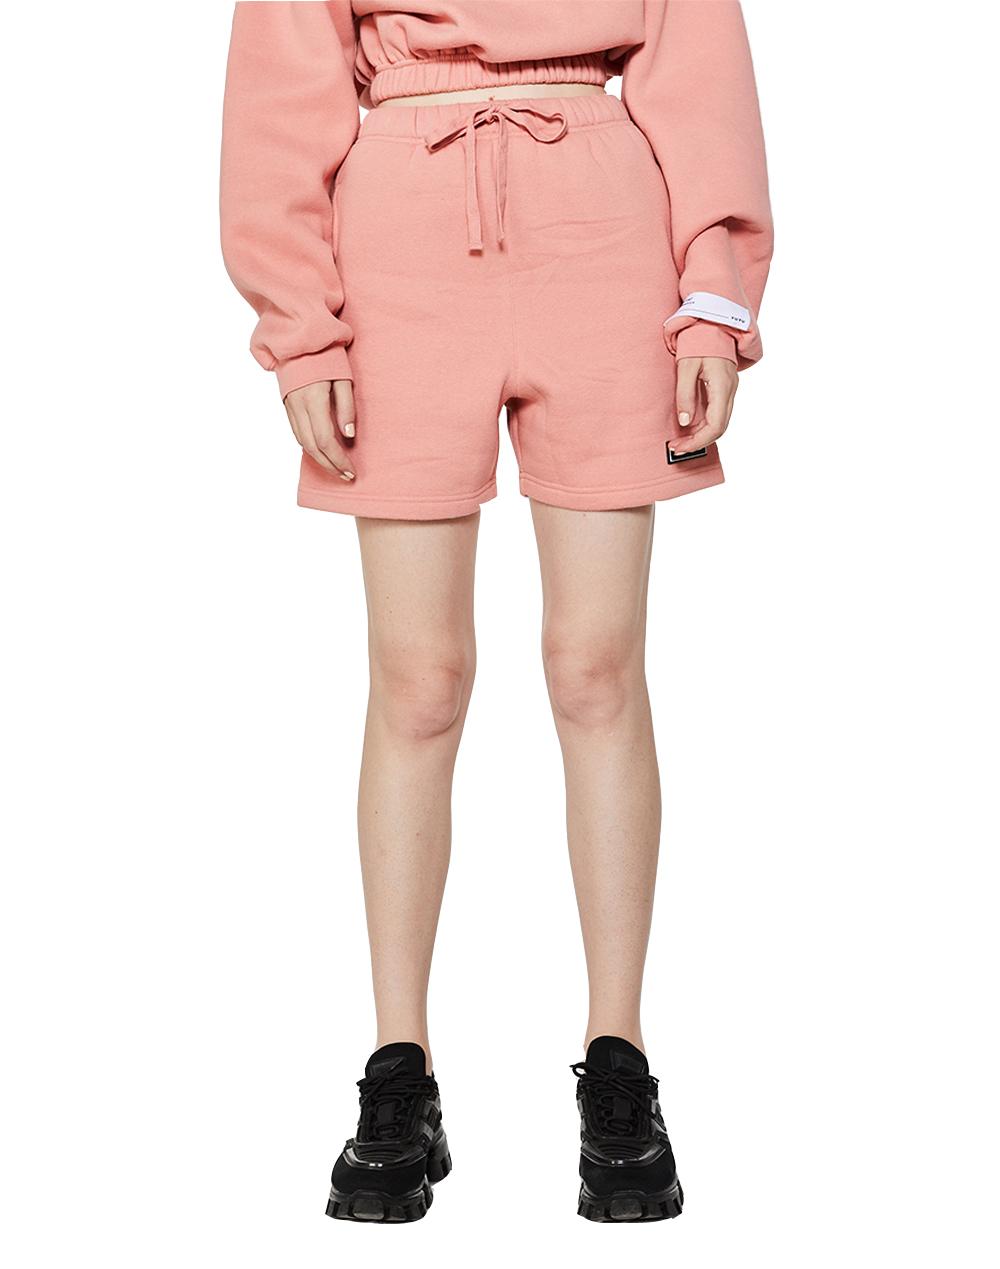 YUYU+Effortless Chic Shorts